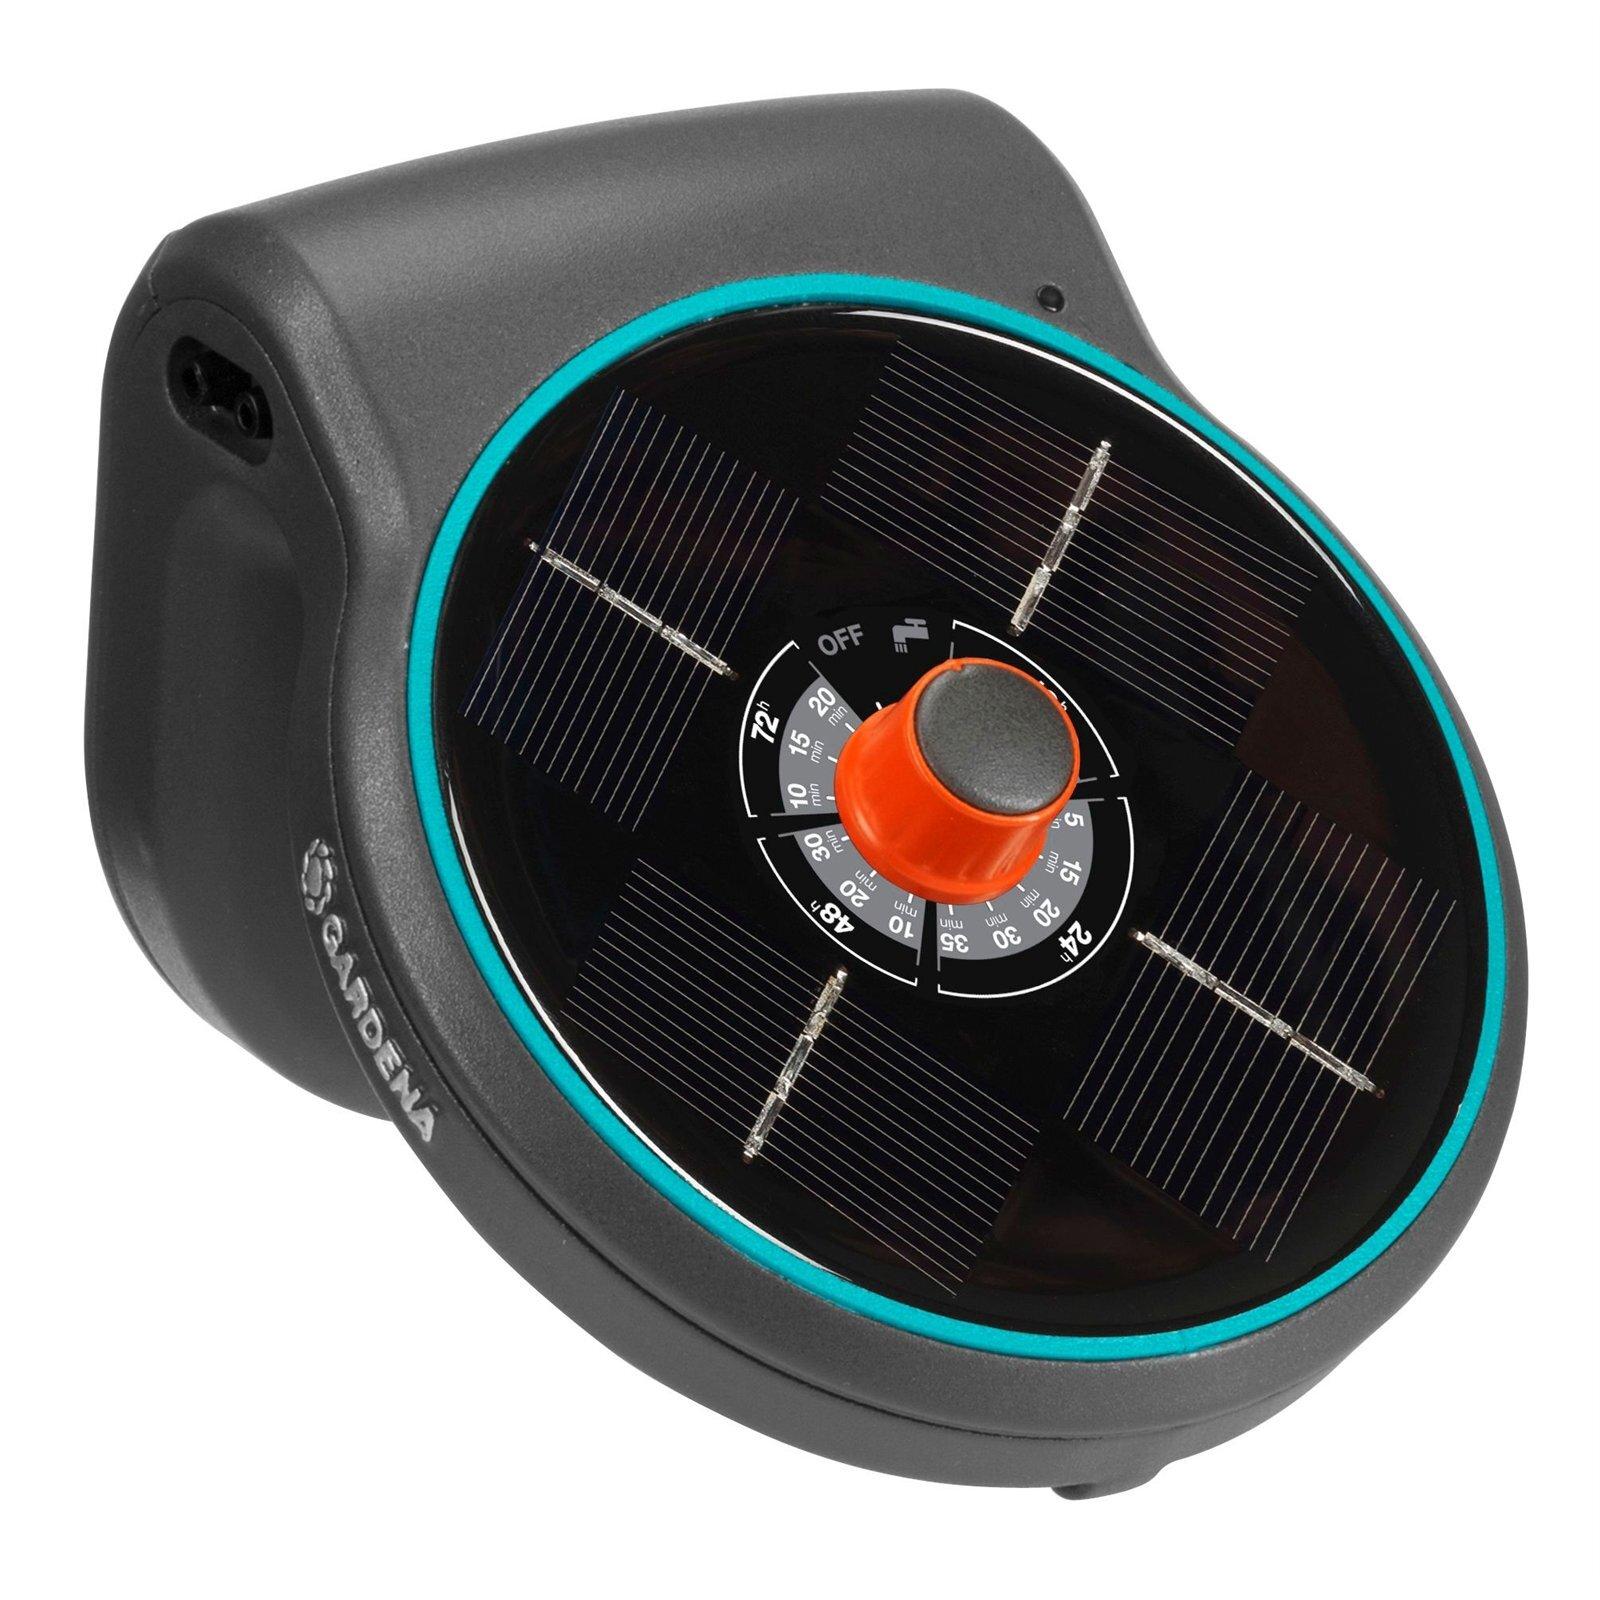 Gardena AquaBloom Solar-powered Irrigation Set